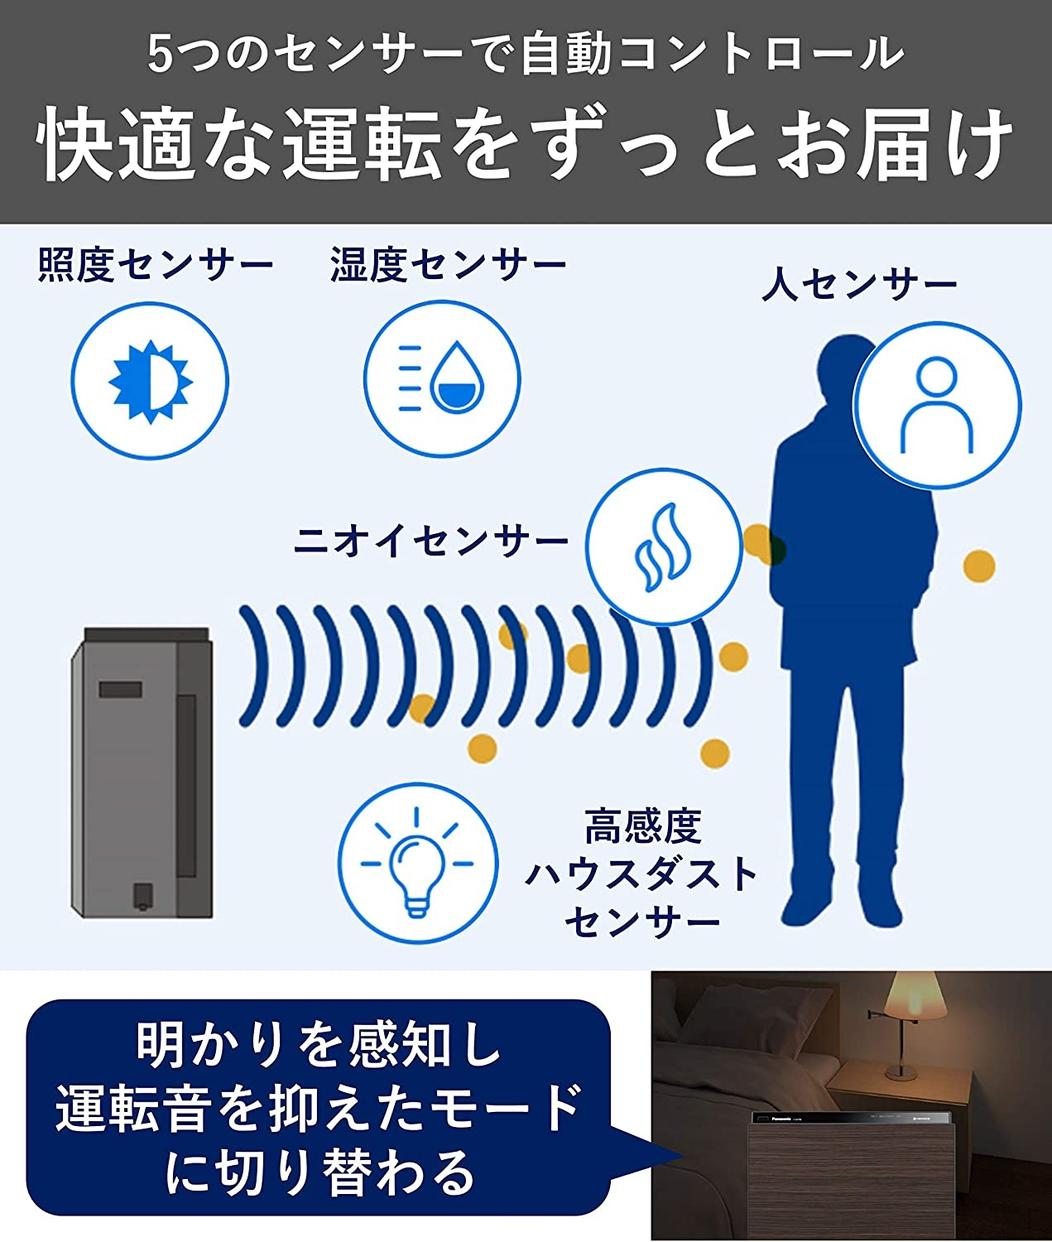 Panasonic(パナソニック) 加湿空気清浄機 F-VXT90の商品画像4